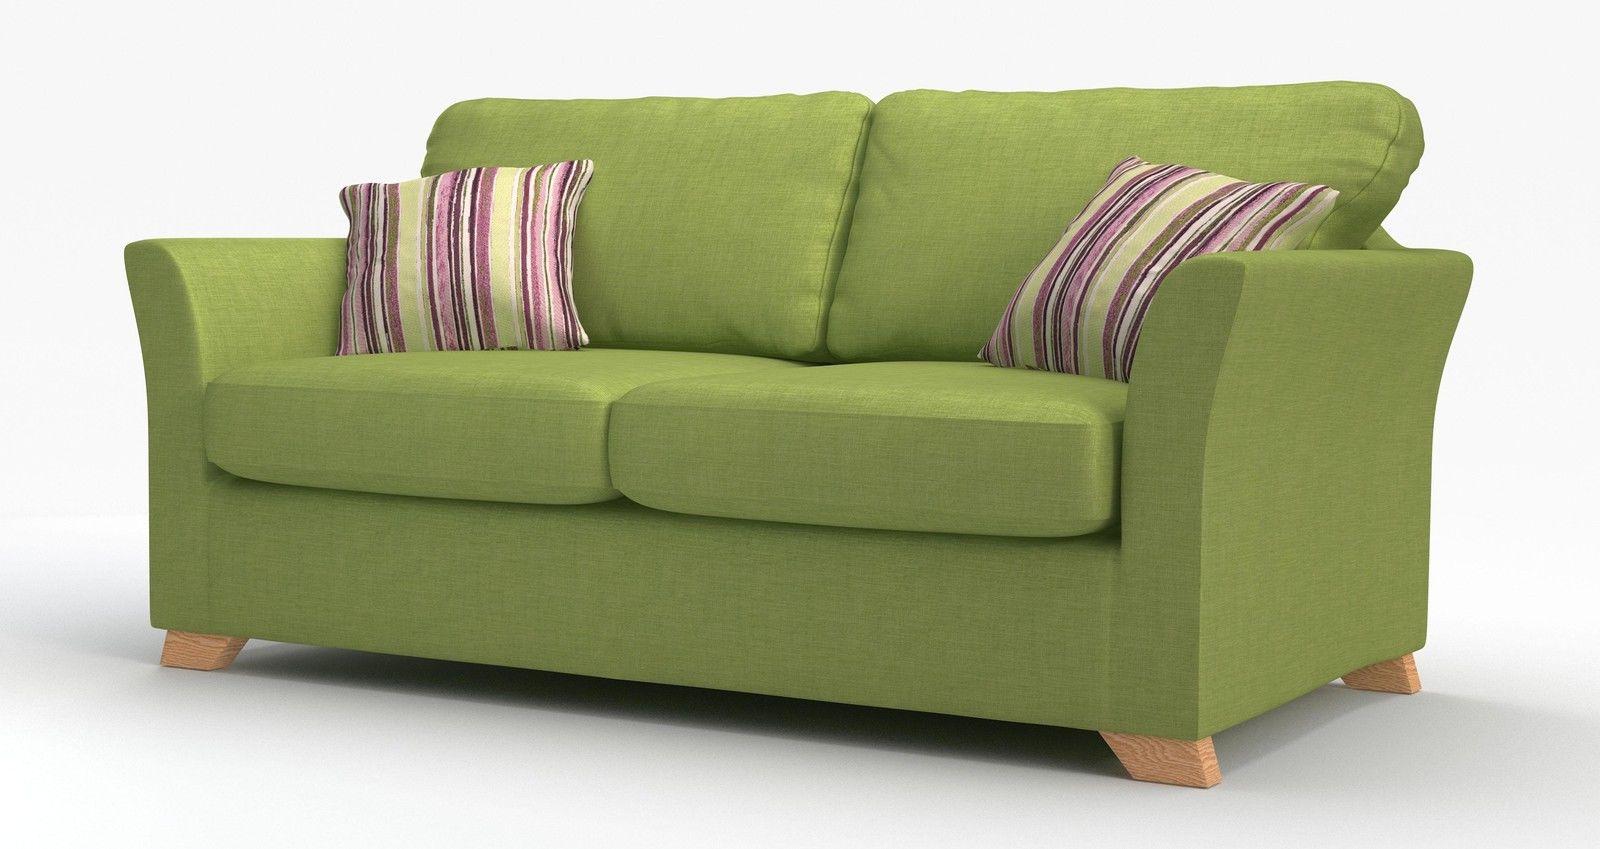 Dfs Corner Sofa Bed Fabric MenzilperdeNet